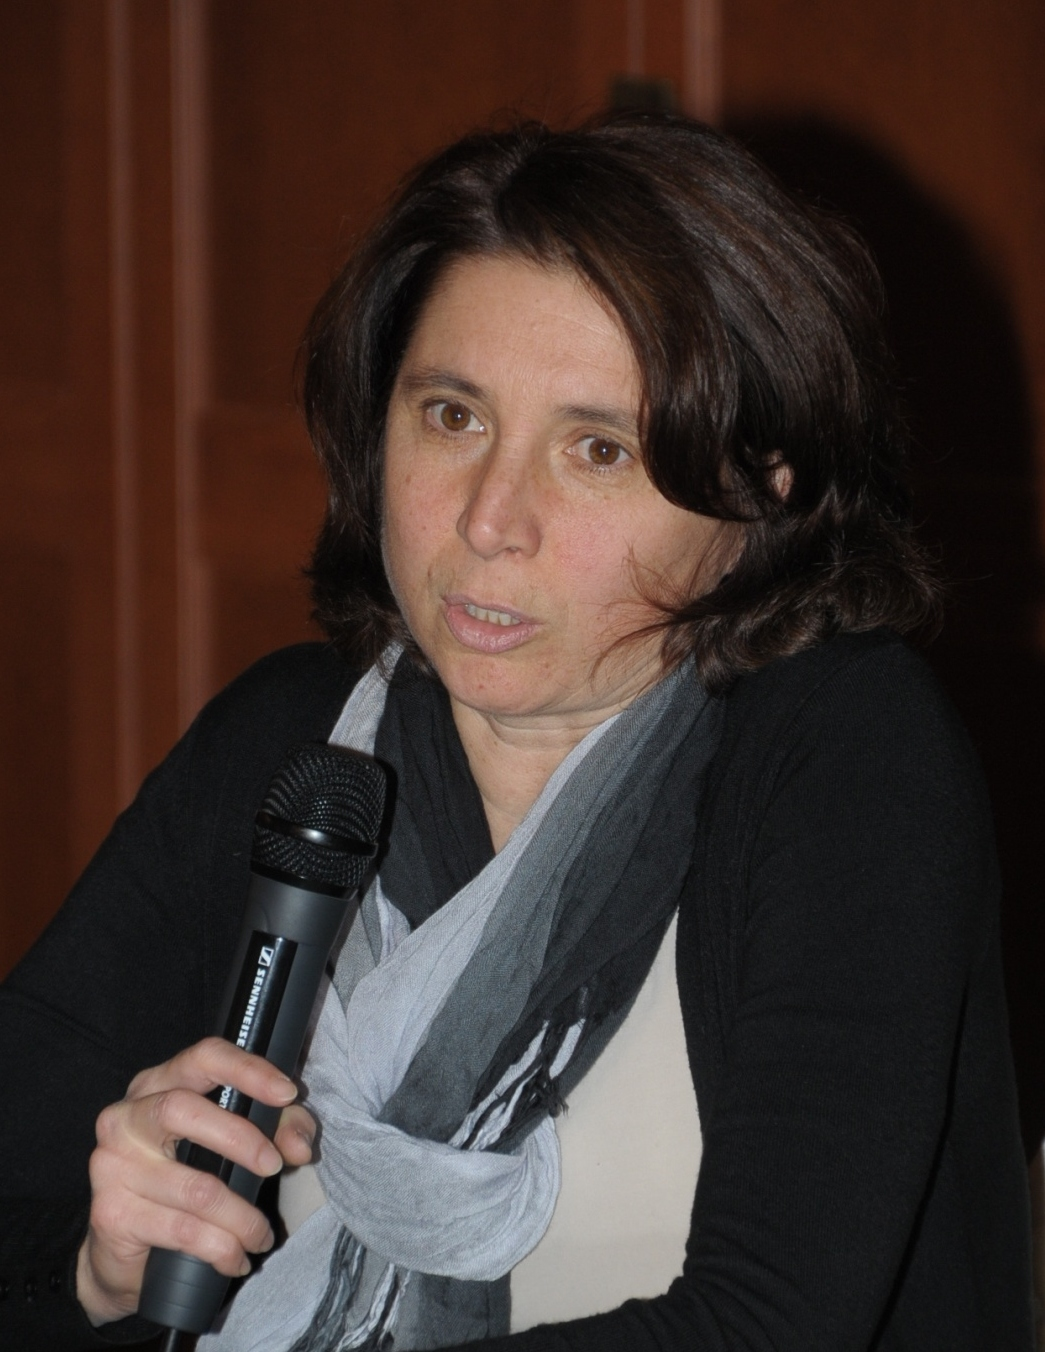 Barbara Cambiaso